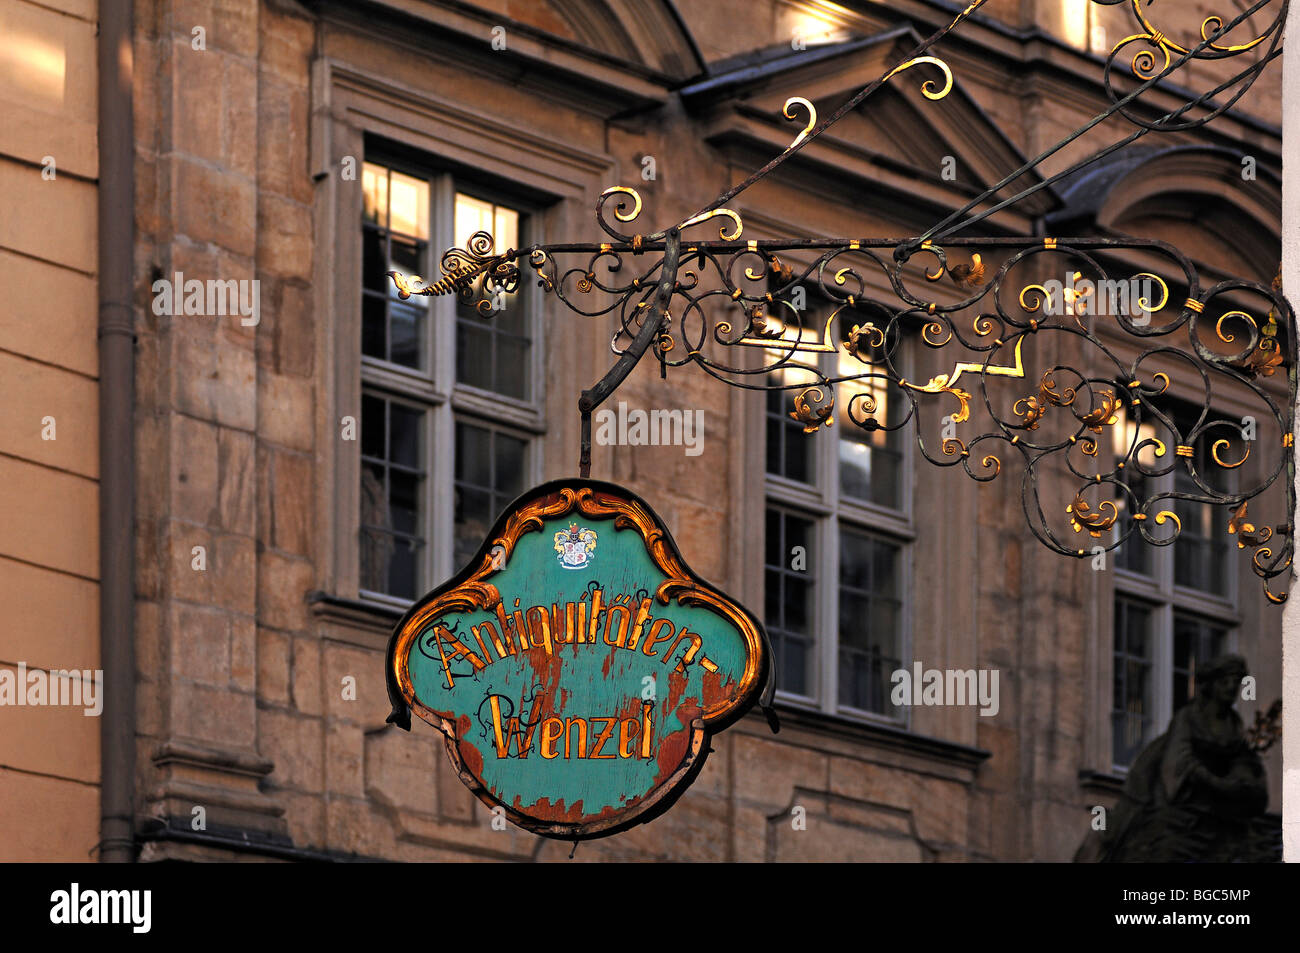 Old hanging sign 'Antiquitaeten Wenzel, Karolinenstrasse, Bamberg, Upper Franconia, Bavaria, Germany, Europe - Stock Image